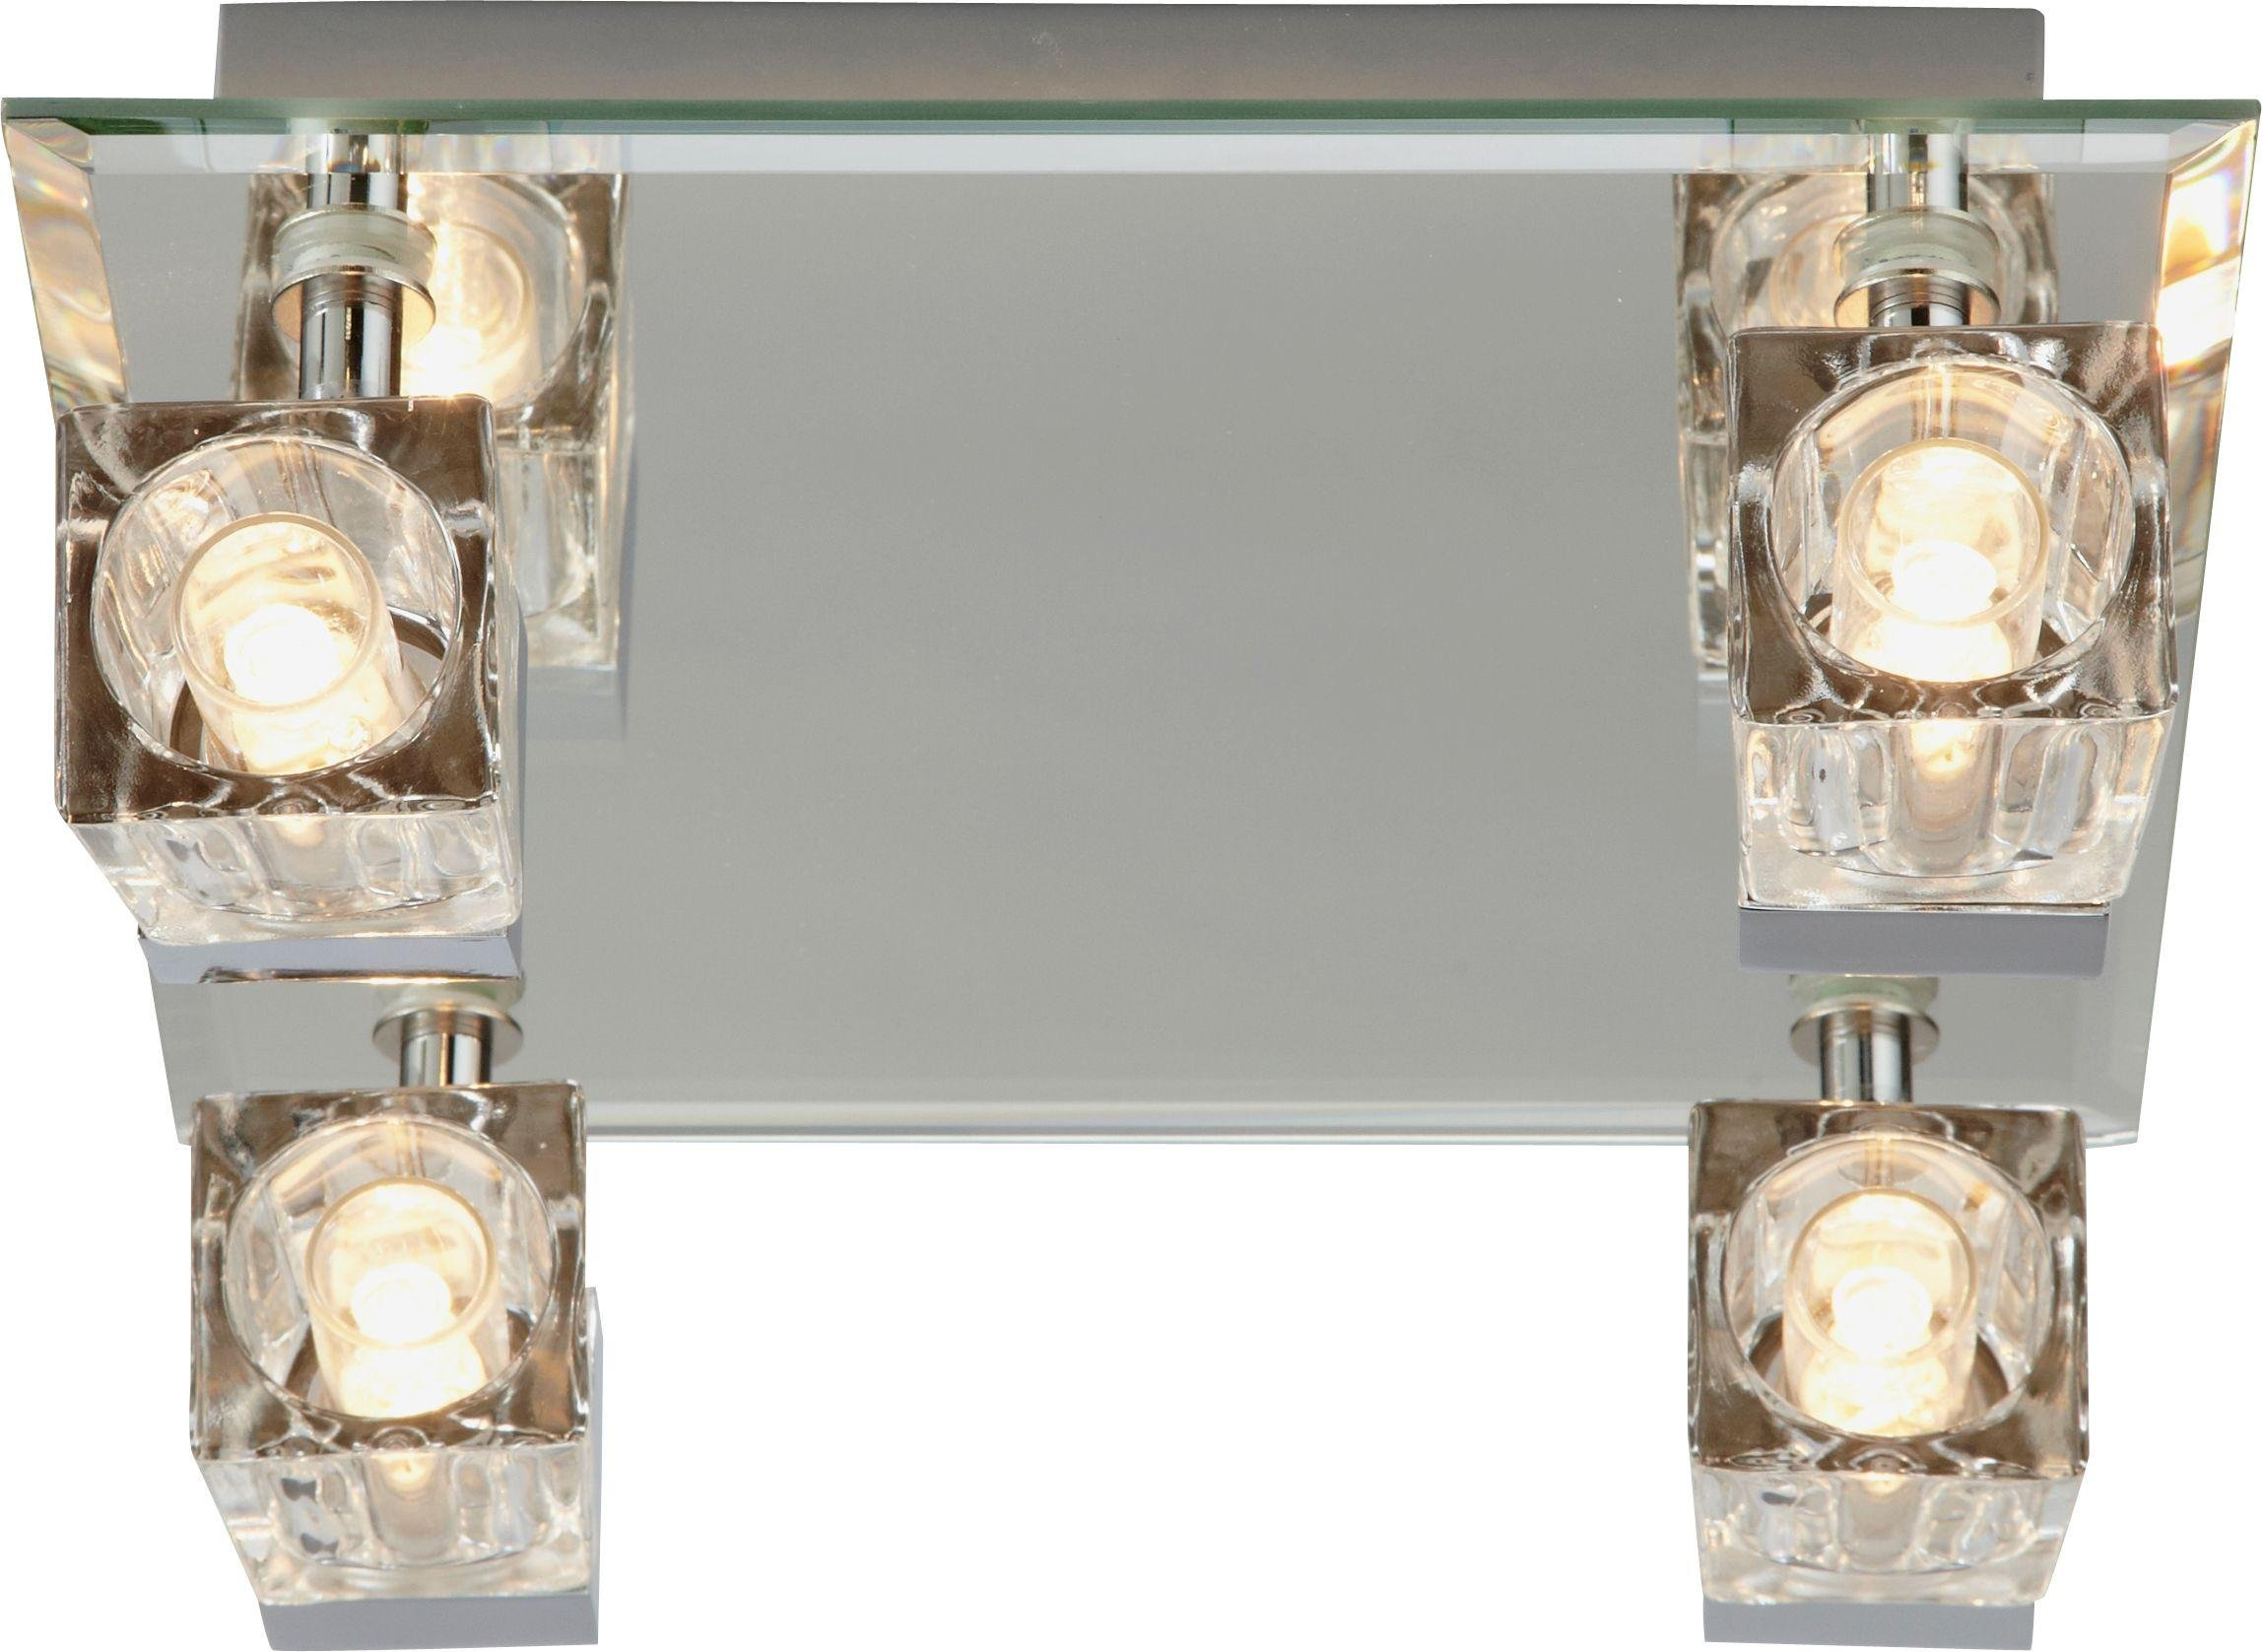 Argos Home - Mira Cube Bathroom 4 Spotlight Ceiling Plate